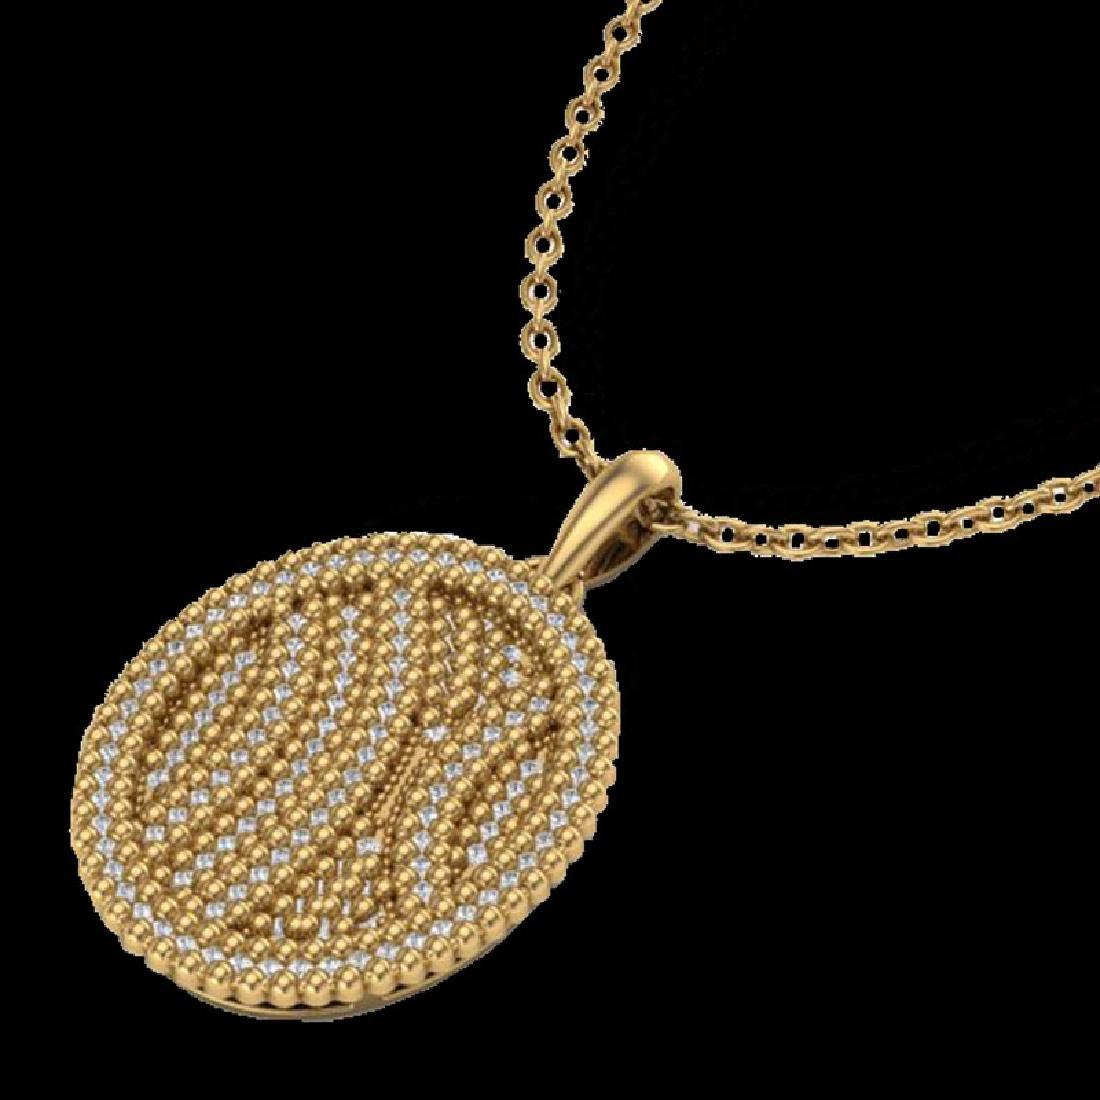 1 CTW Micro Pave VS/SI Diamond Necklace 14K Yellow Gold - 2